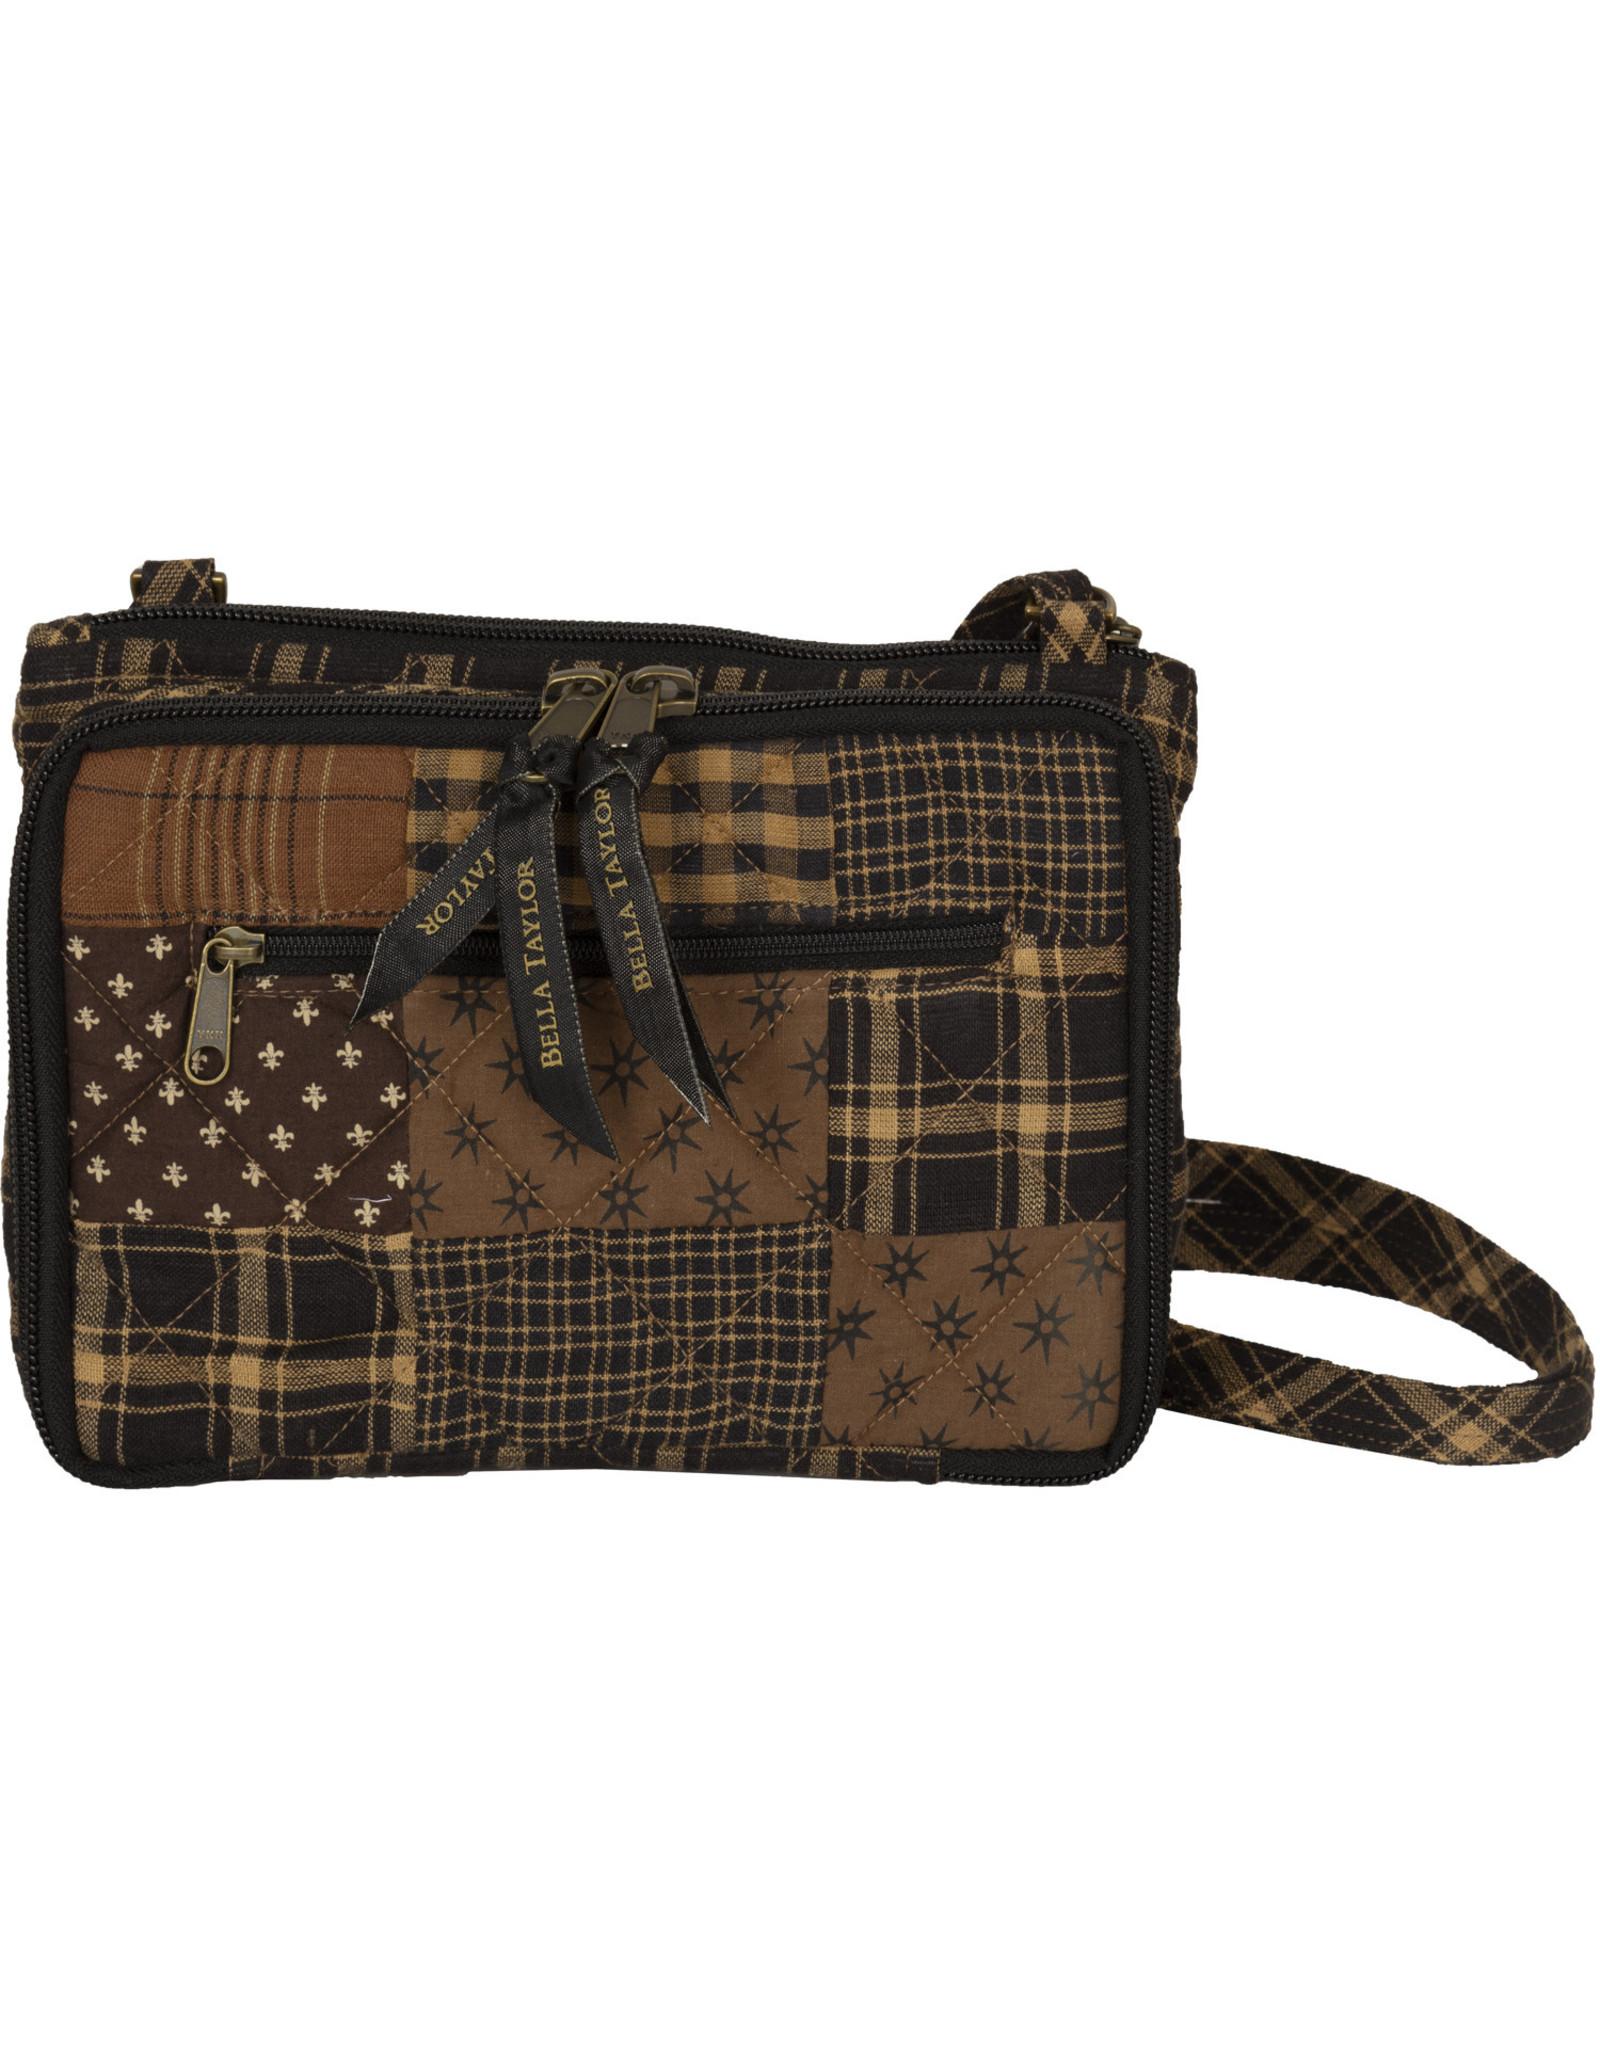 Bella Taylor Ironstone - Essentials handbag